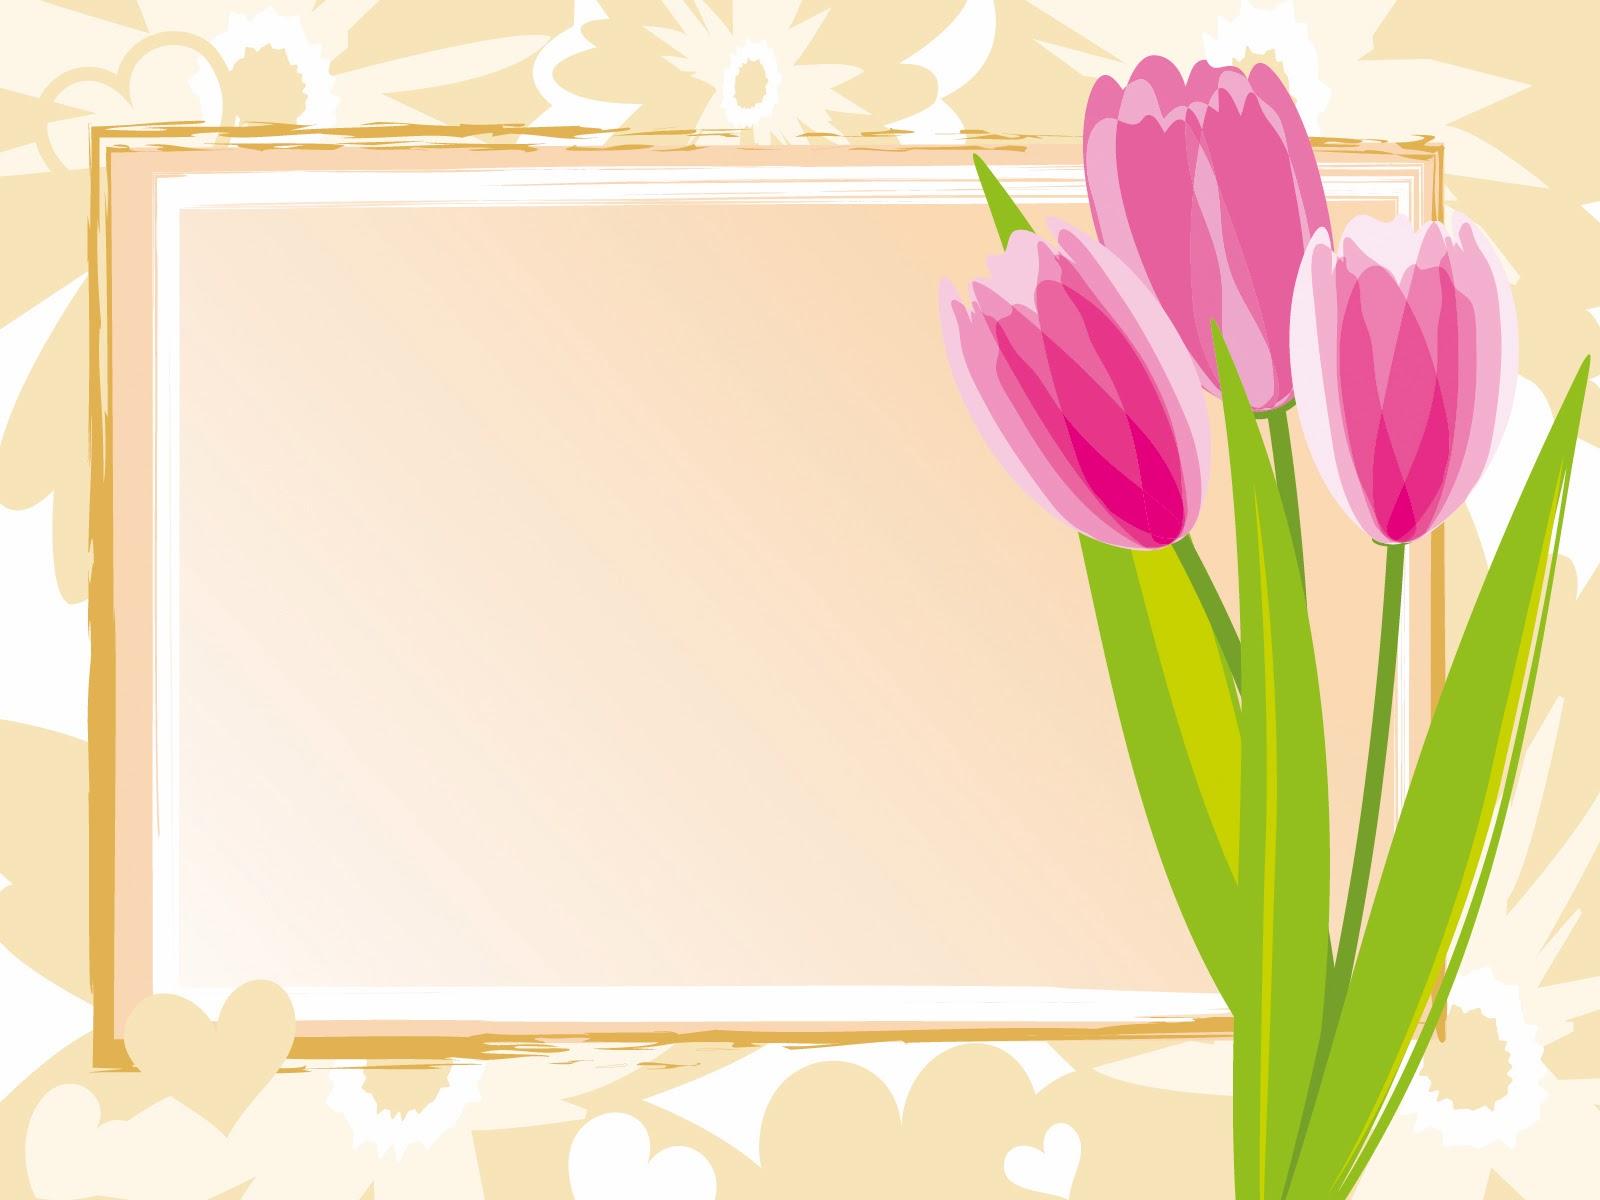 Gambar Bunga Untuk Powerpoint Abstract Flower Background By Ok Sana Graphicriver Gambar Allah